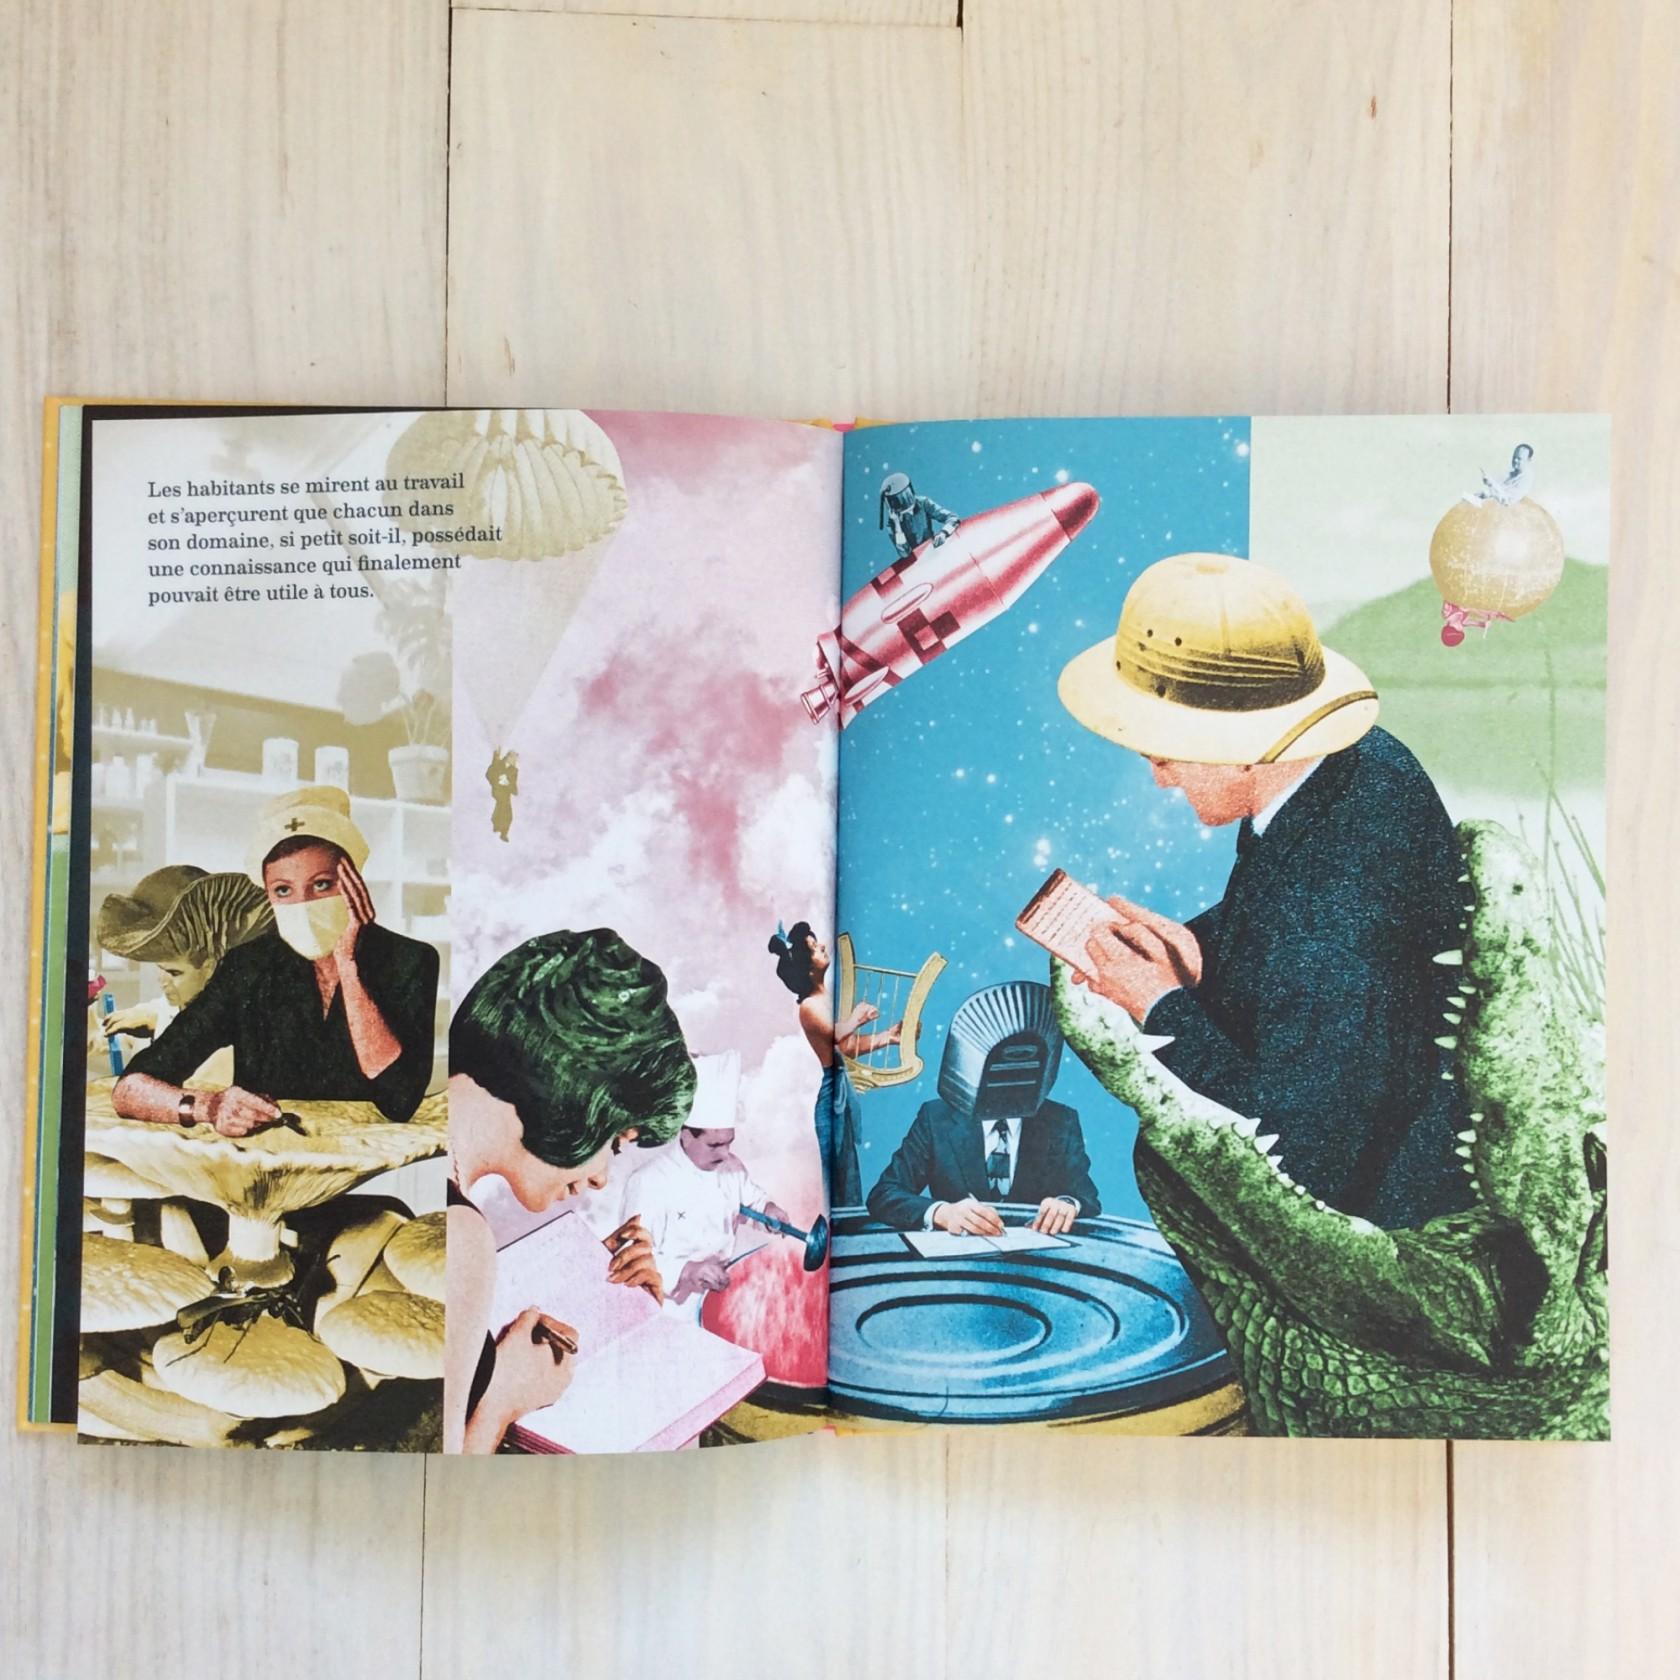 fouinzanardi -  fz_print.books_lesfourmsirouges7